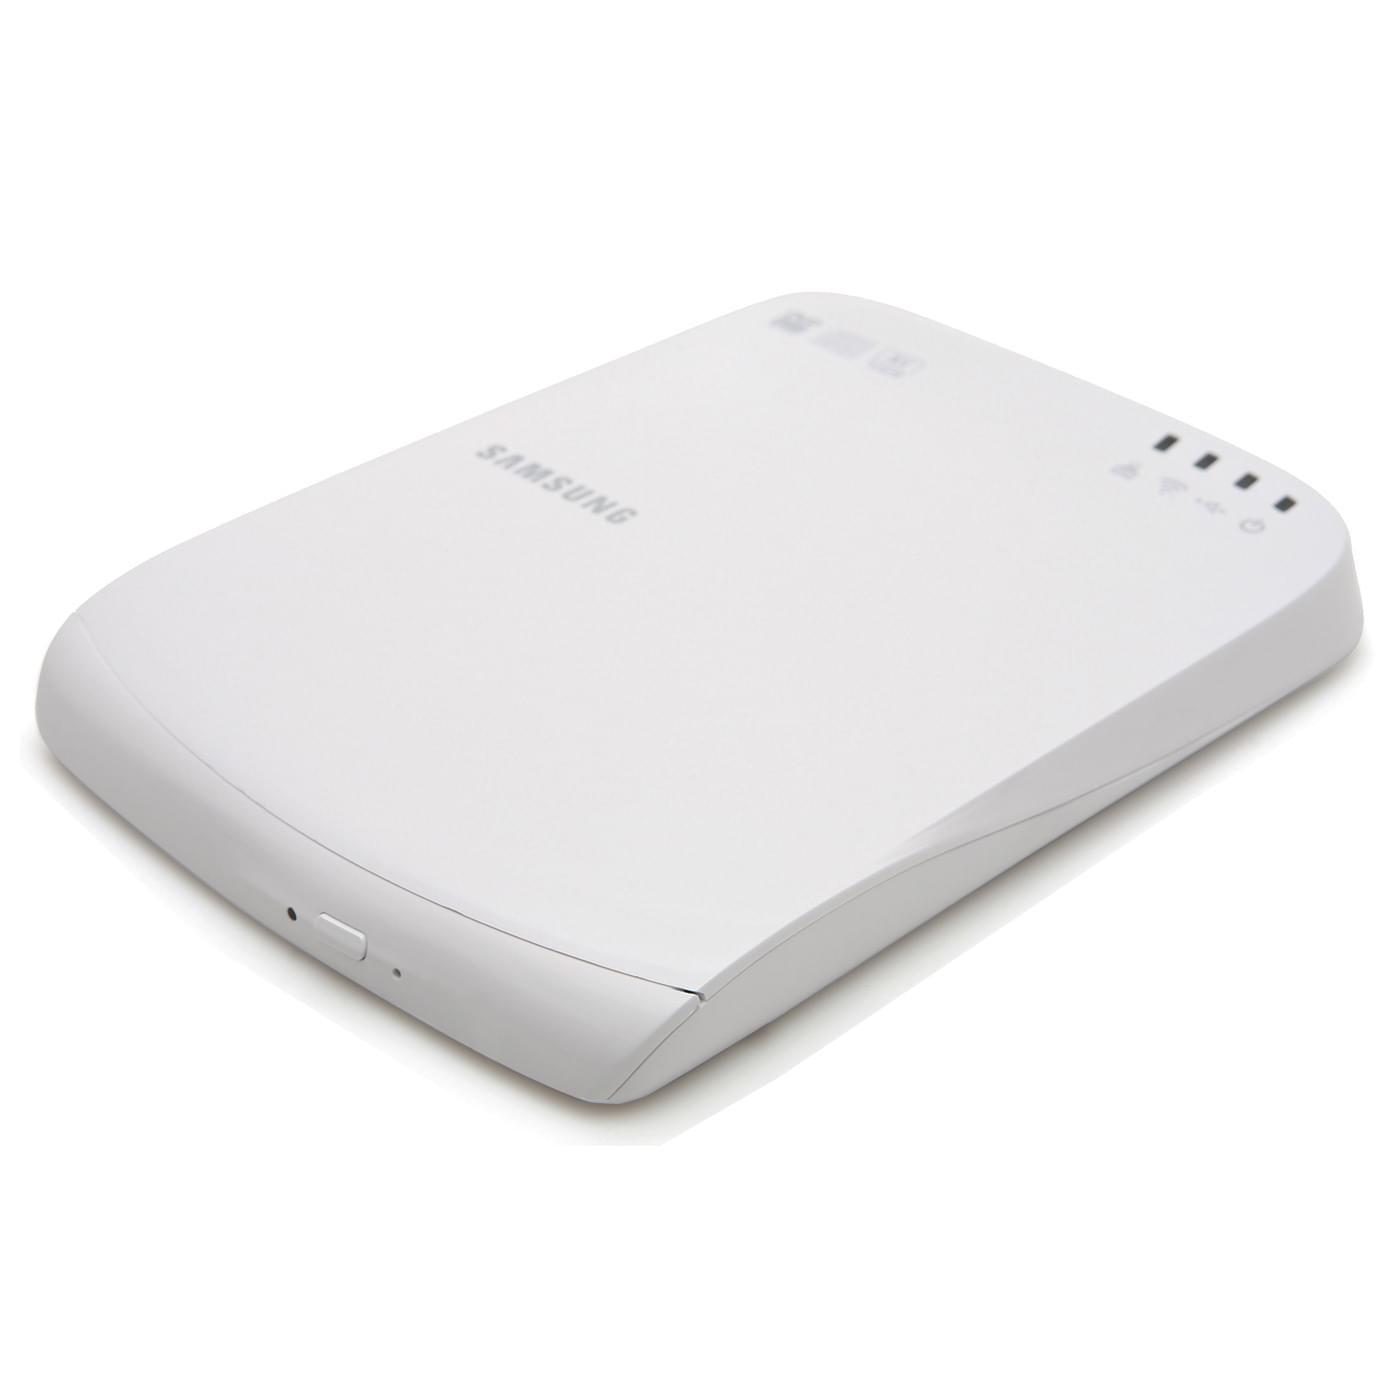 Samsung SE-208BW Externe Slim WiFi Blanc DVD+/-RW 8X DL (SE-208BW/EUWS) - Achat / Vente Graveur sur Cybertek.fr - 0